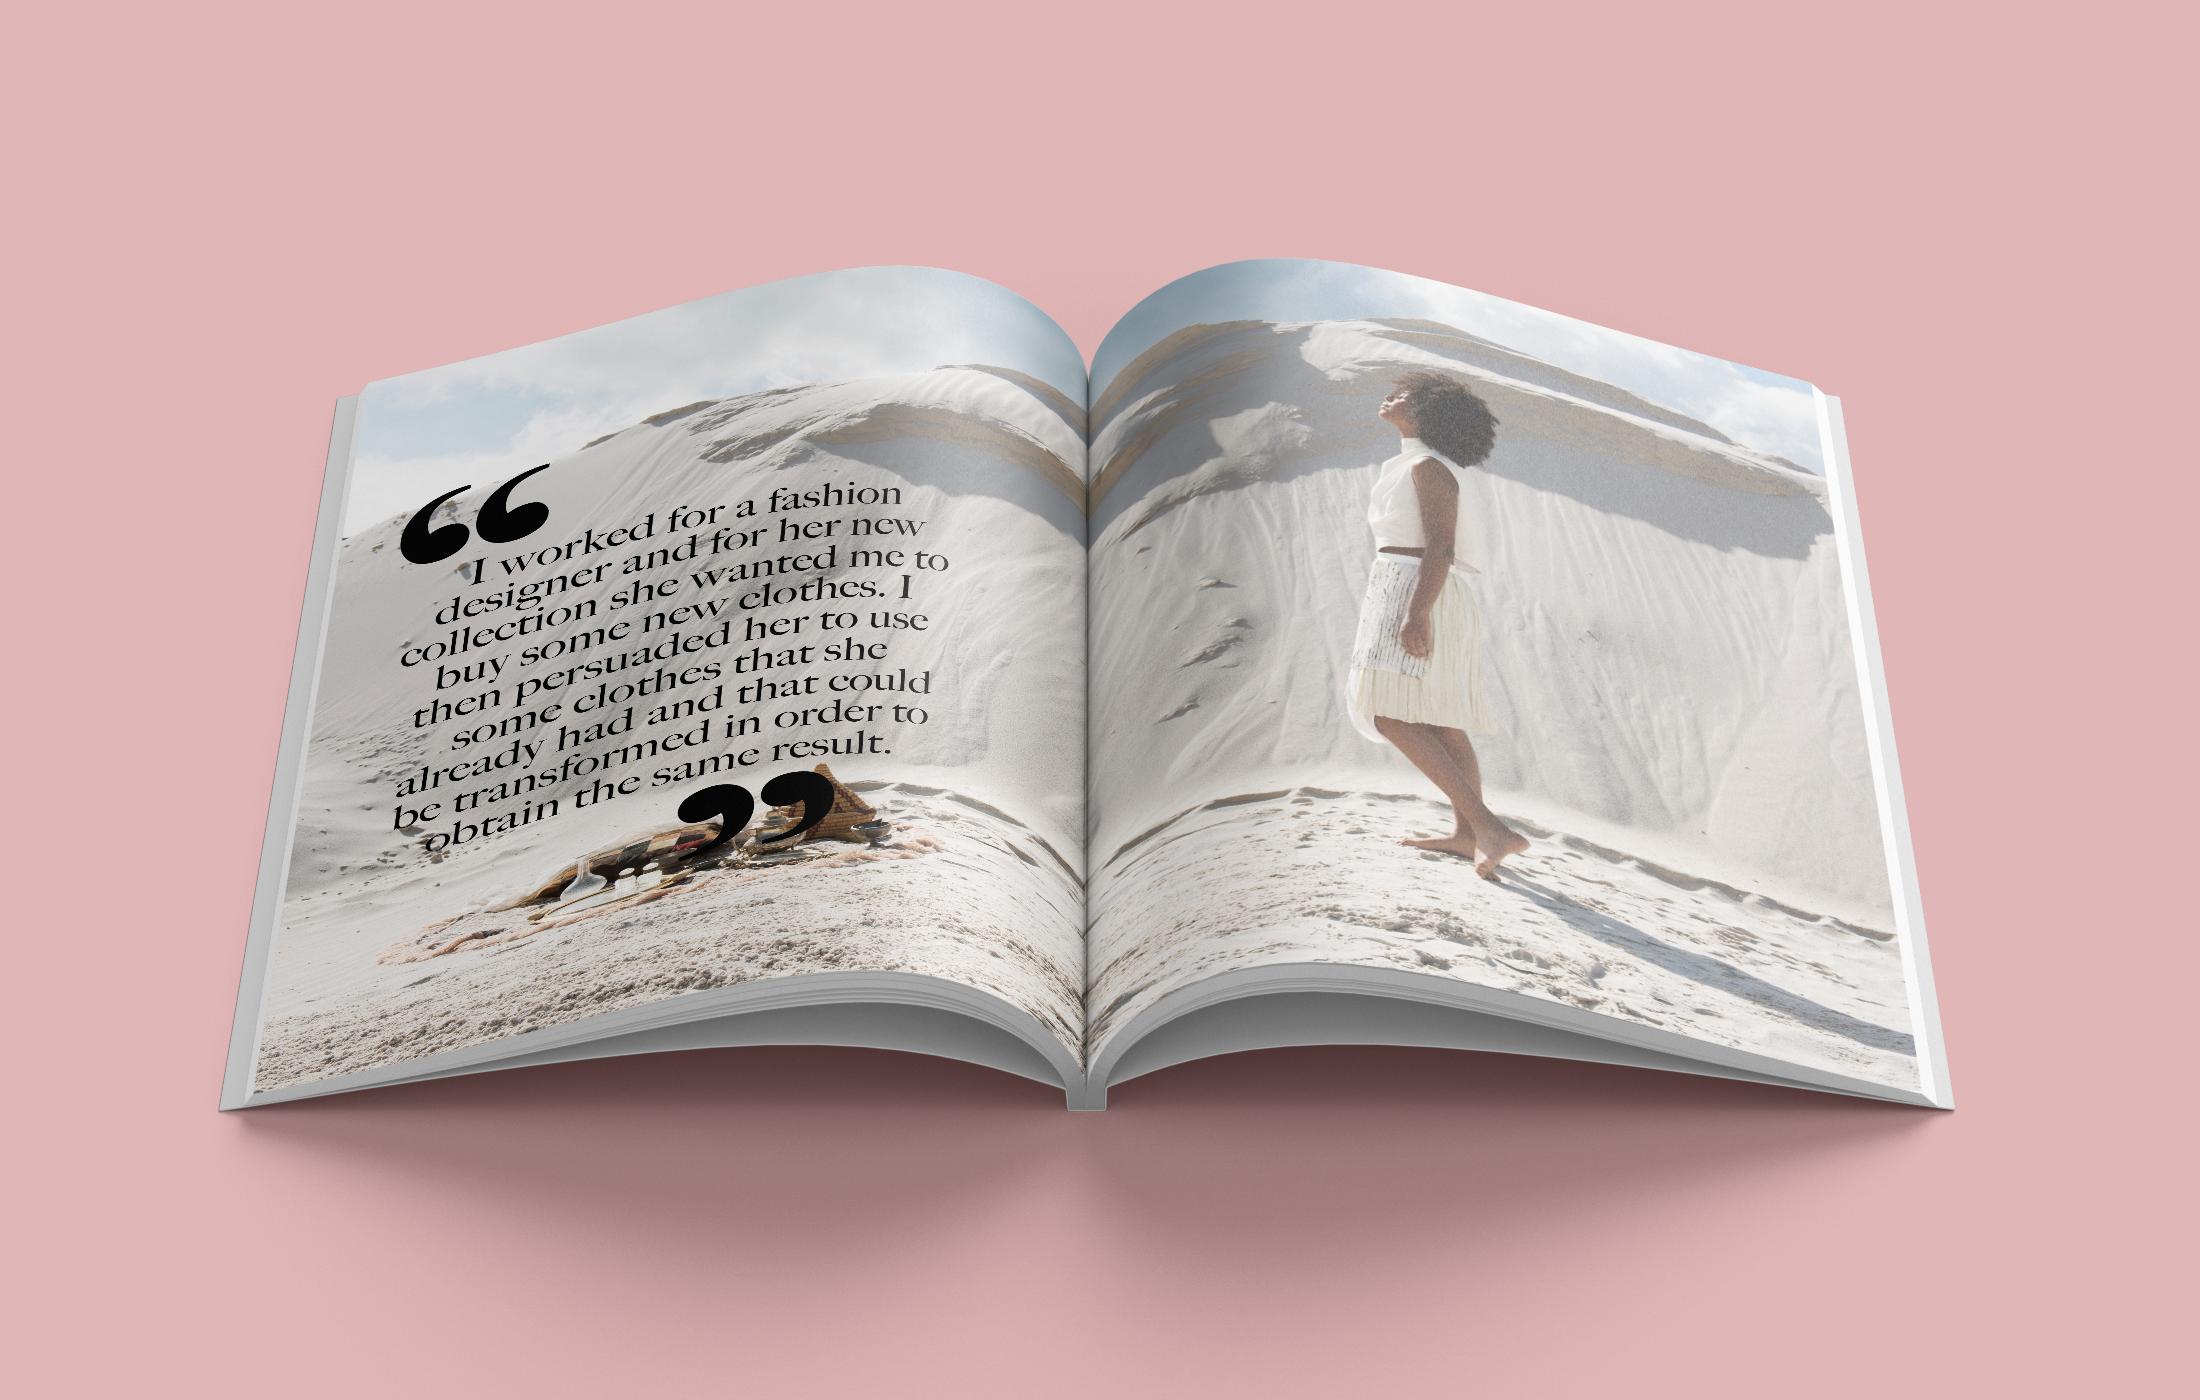 Model Citizen Magazine Issue 36, Macky Suson, Fashion Inclusion Now2.png